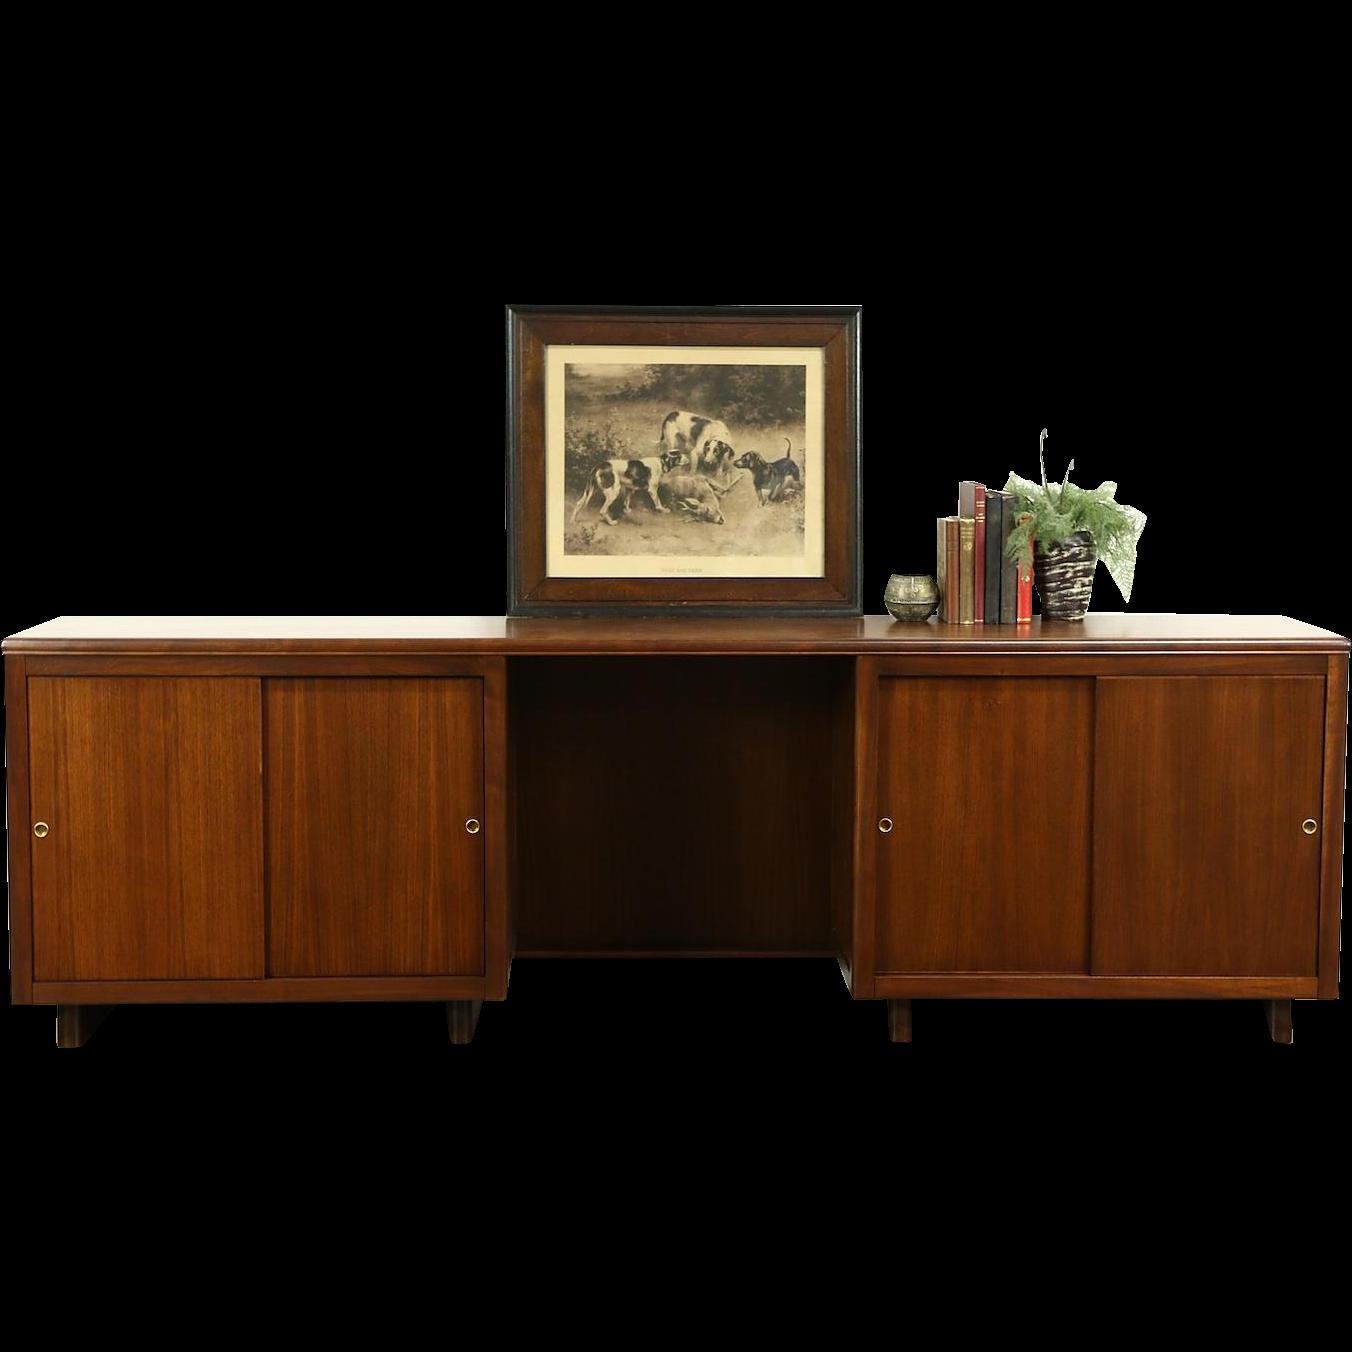 Midcentury Modern 1950's Vintage Executive Credenza, Signed Leopold Chicago